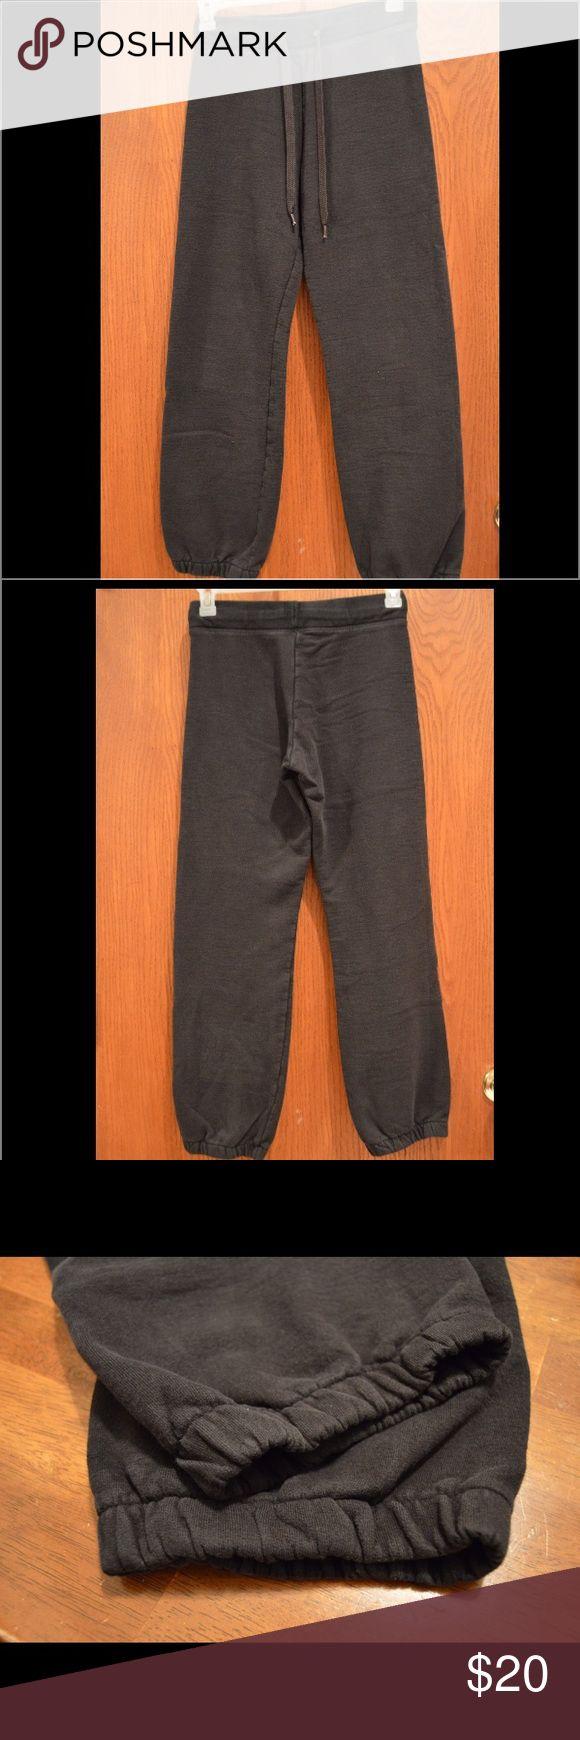 Champion men's athletic pants Athletic pants, drawstring waistband, no pockets, hardly worn Pants Sweatpants & Joggers